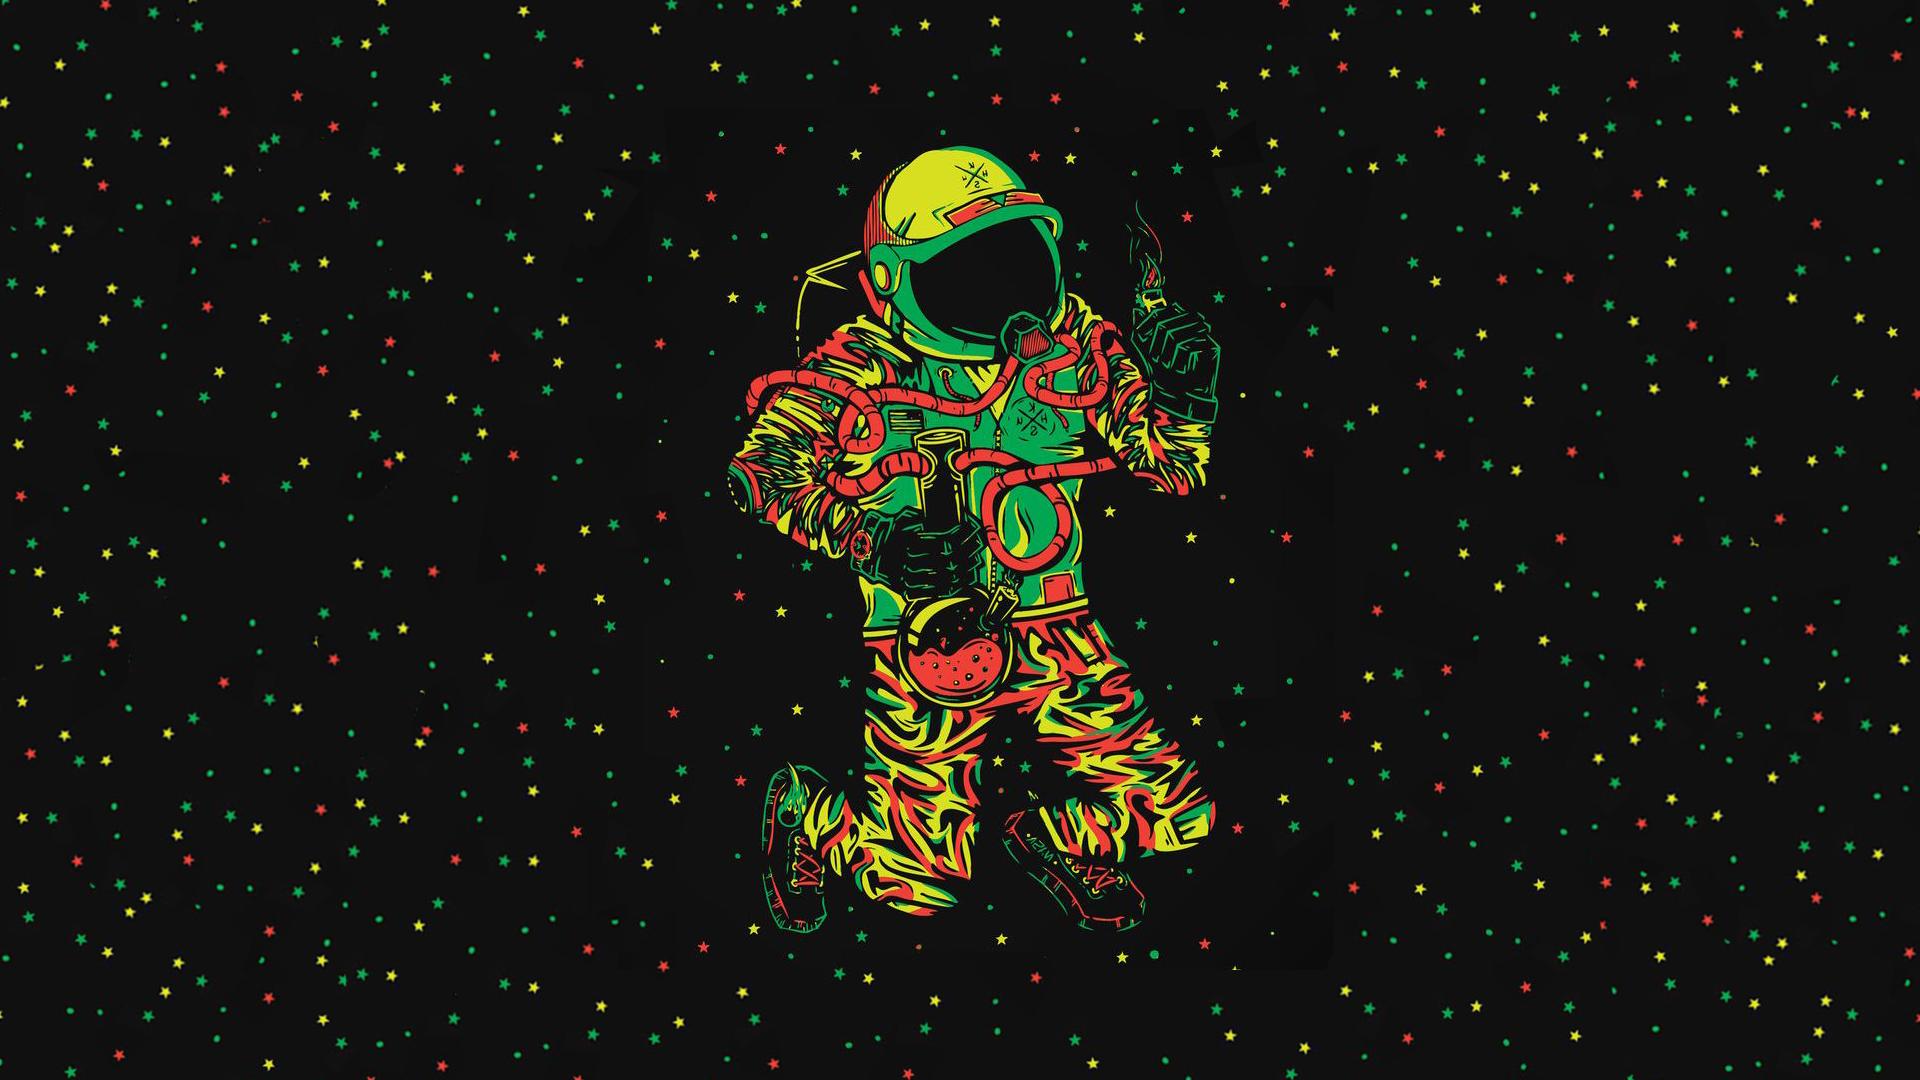 космос трава космонавт space grass astronaut  № 3317159 бесплатно